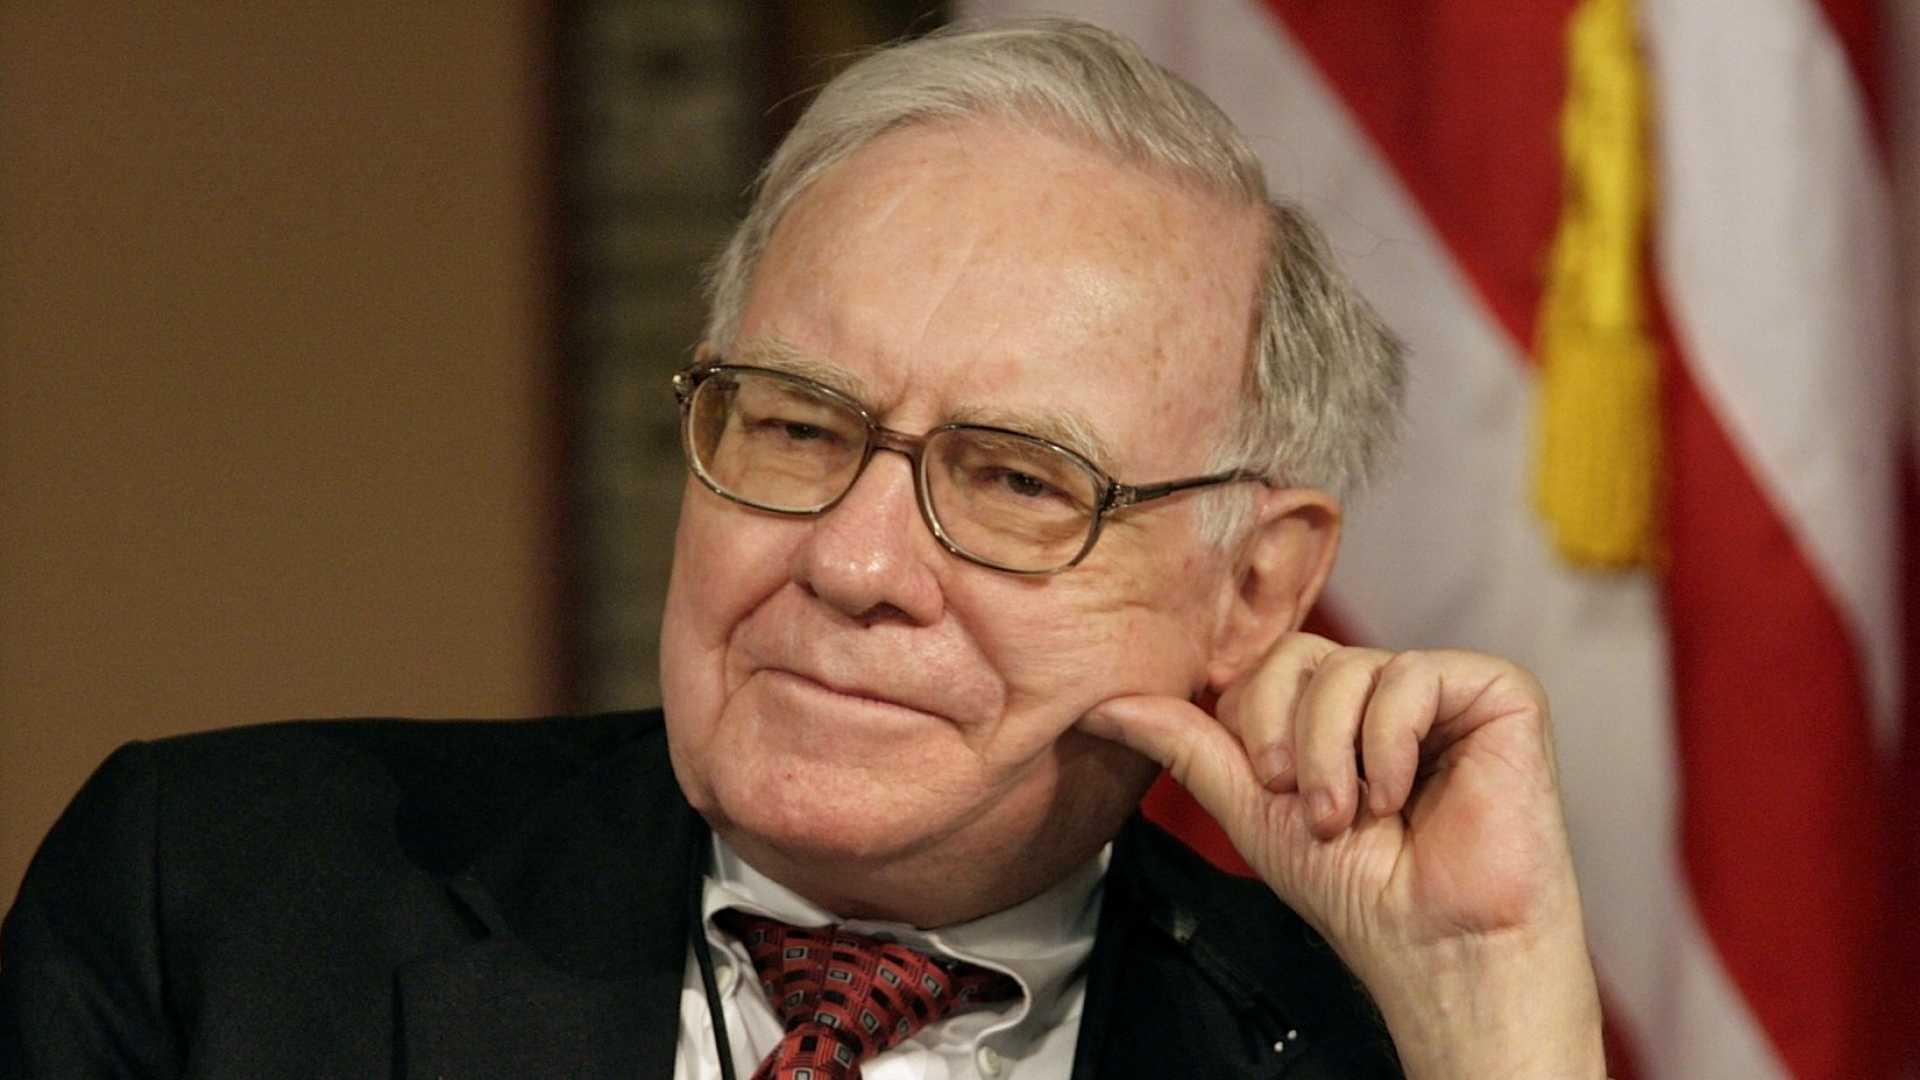 Warren Buffett's Annual Letter Just Revealed What Makes a Role-Model Leader in 1 Sentence